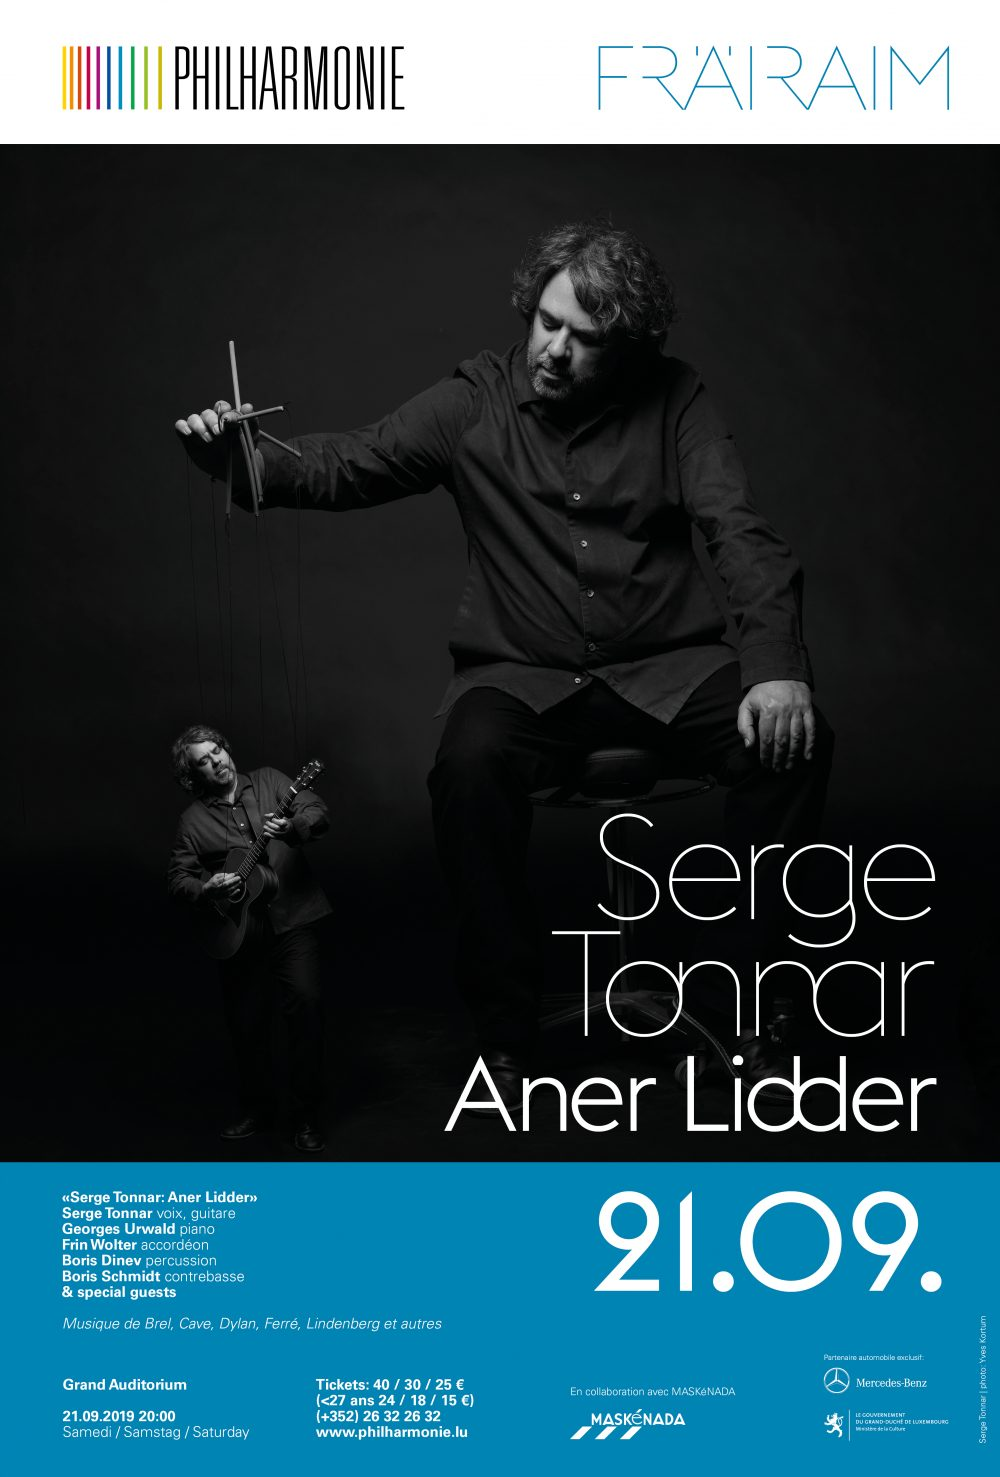 Serge Tonnar: Aner Lidder